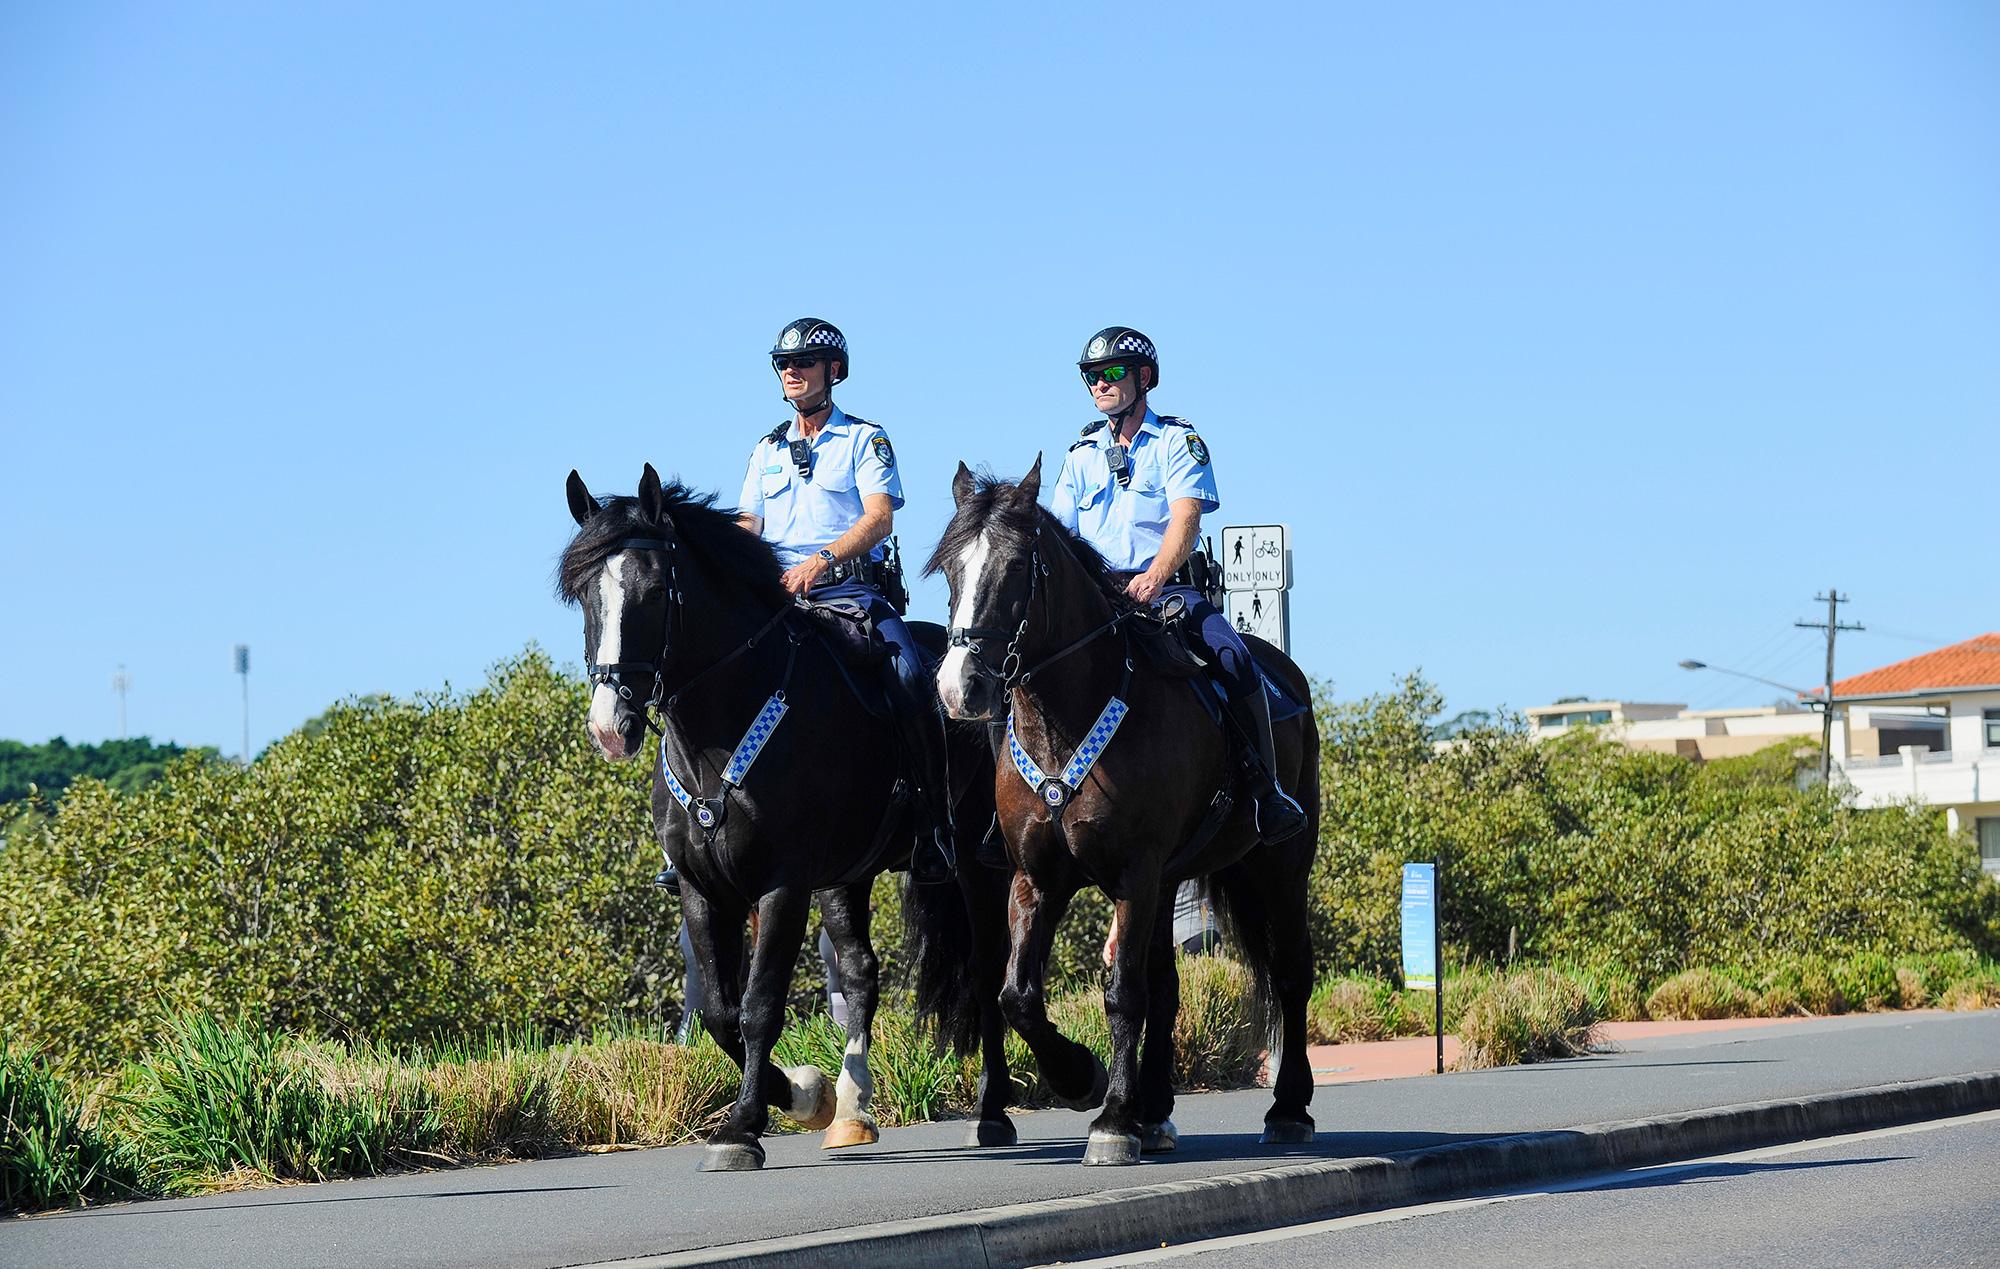 australia police safe distancing covid-19 coronavirus